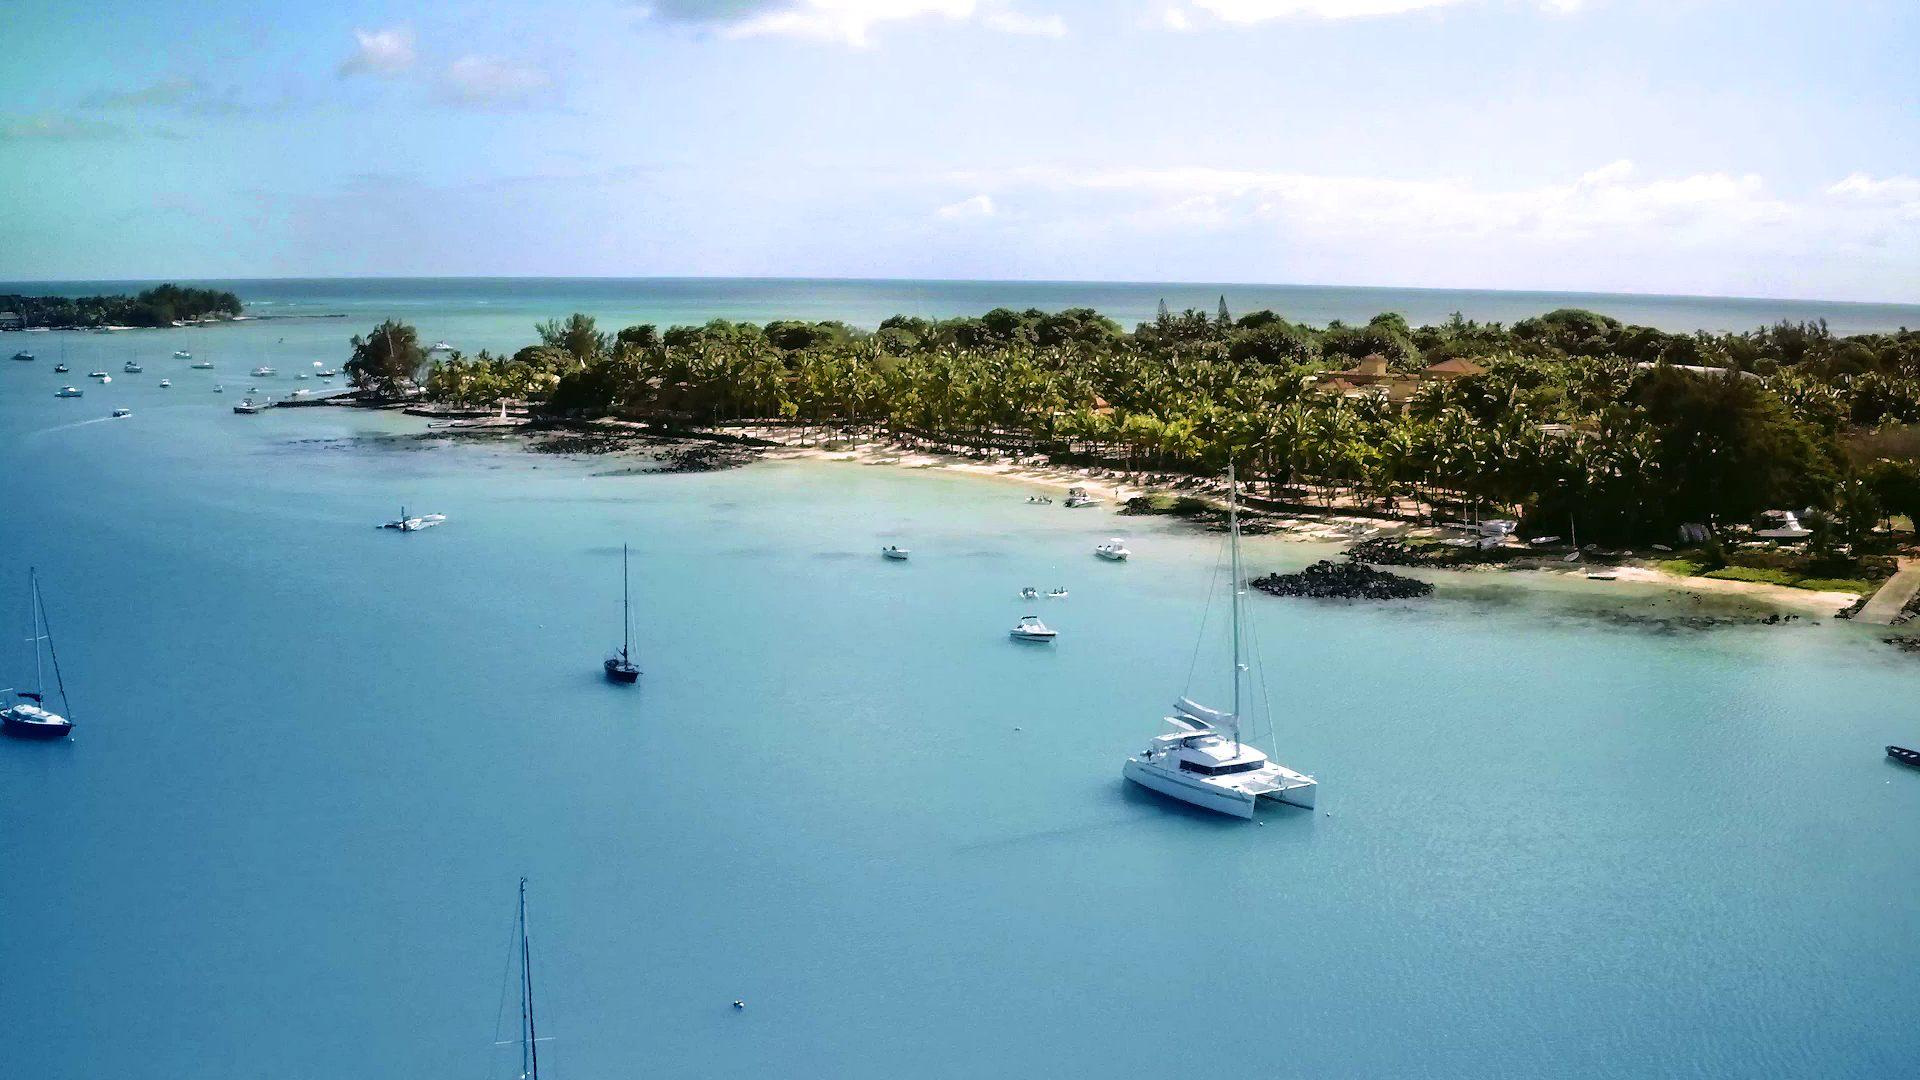 Lit Bebe Promo Joli the Hotel Mauricia Beach Ber Beach Ber Resorts & Hotels In